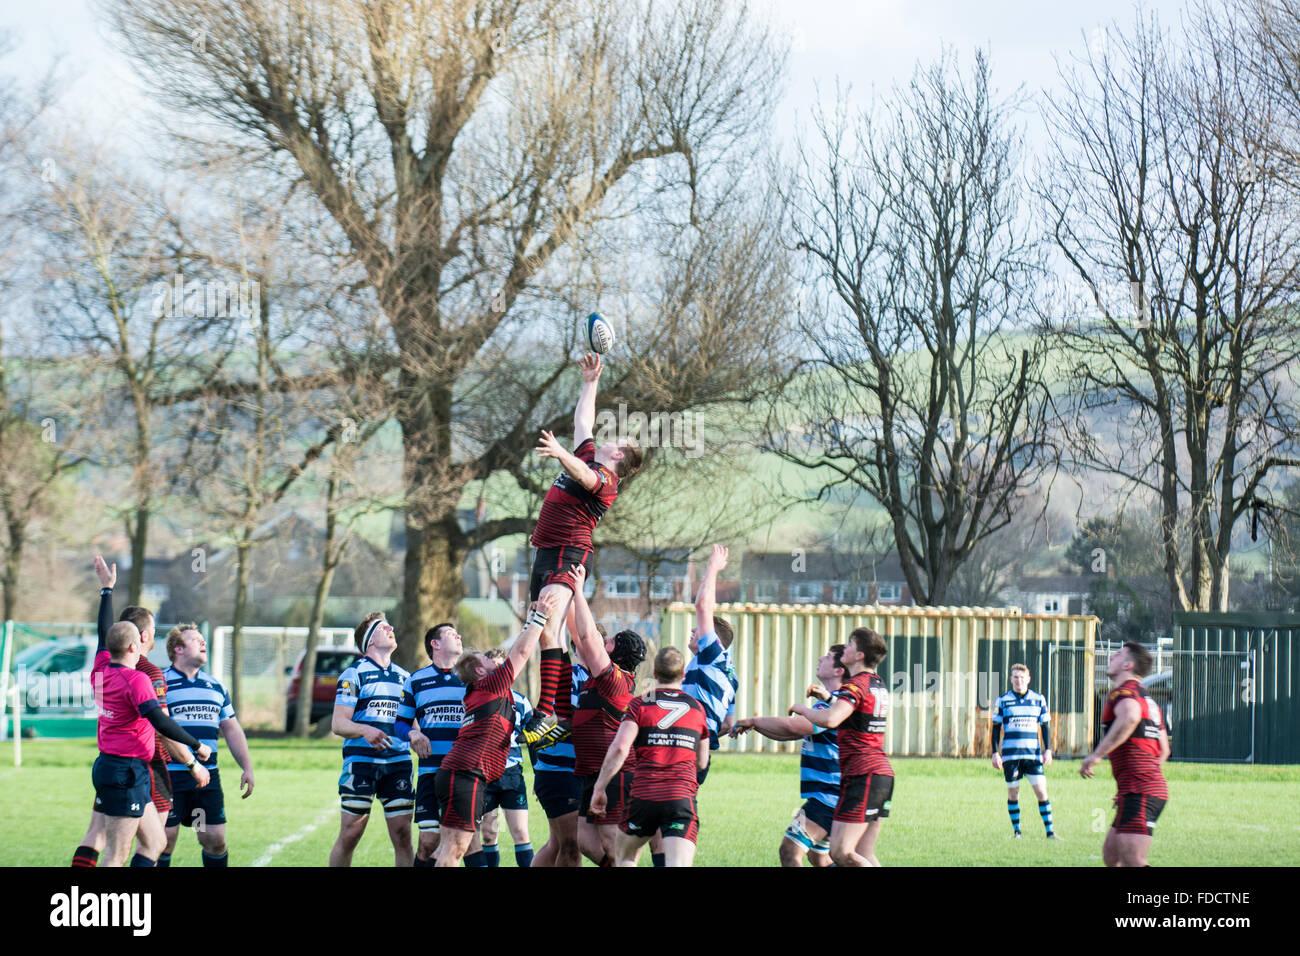 Aberystwyth, West Wales, UK 30th January 2016 Sport. Aberystwyth RFC (1st Team) vs Carmarthen Athletic RFC (1st Stock Photo